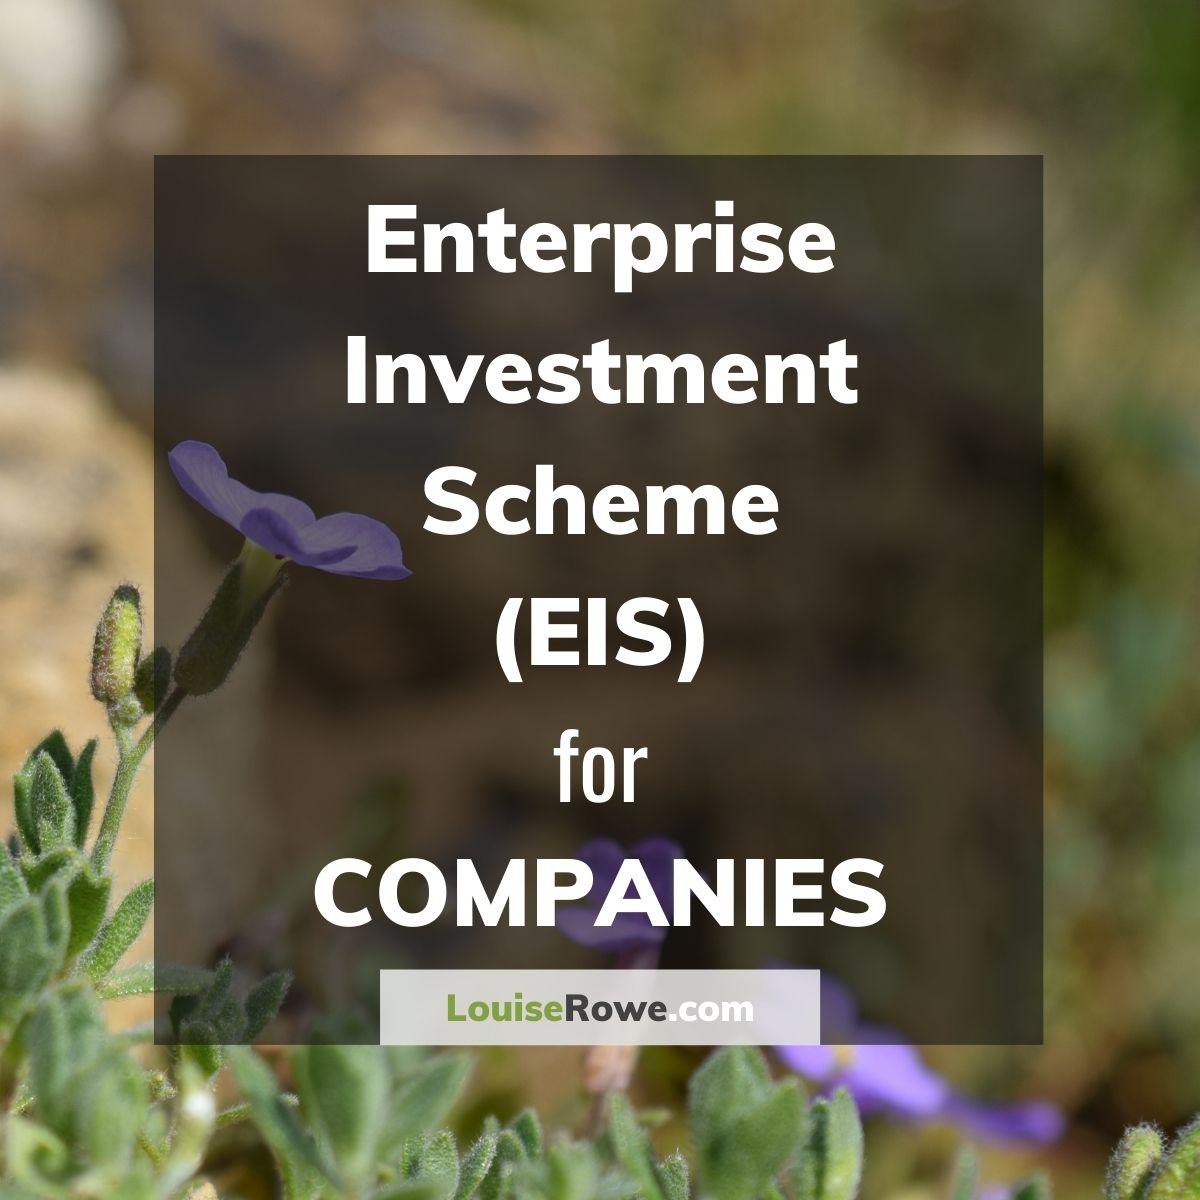 Enterprise Investment Scheme (EIS) for Companies (title). Photo credit © L Rowe 2016